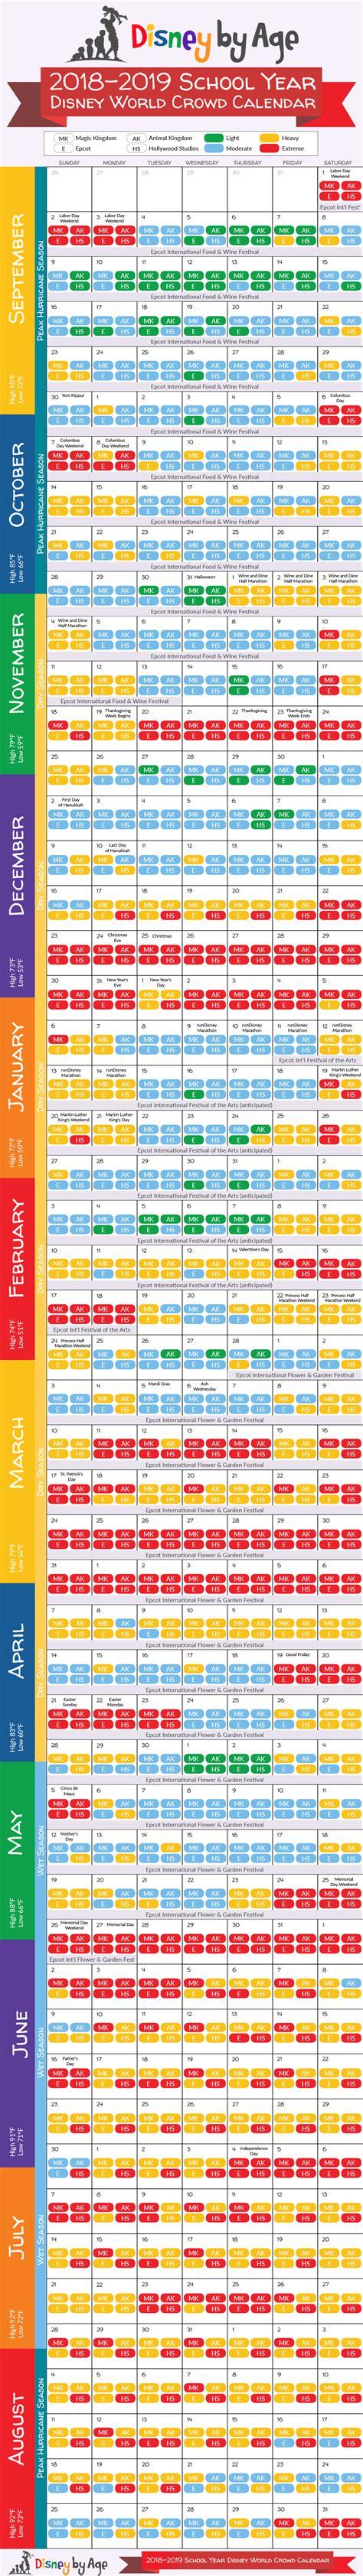 Disney World Crowd Calendar Disney World Crowd Calendar 2018 And 2019